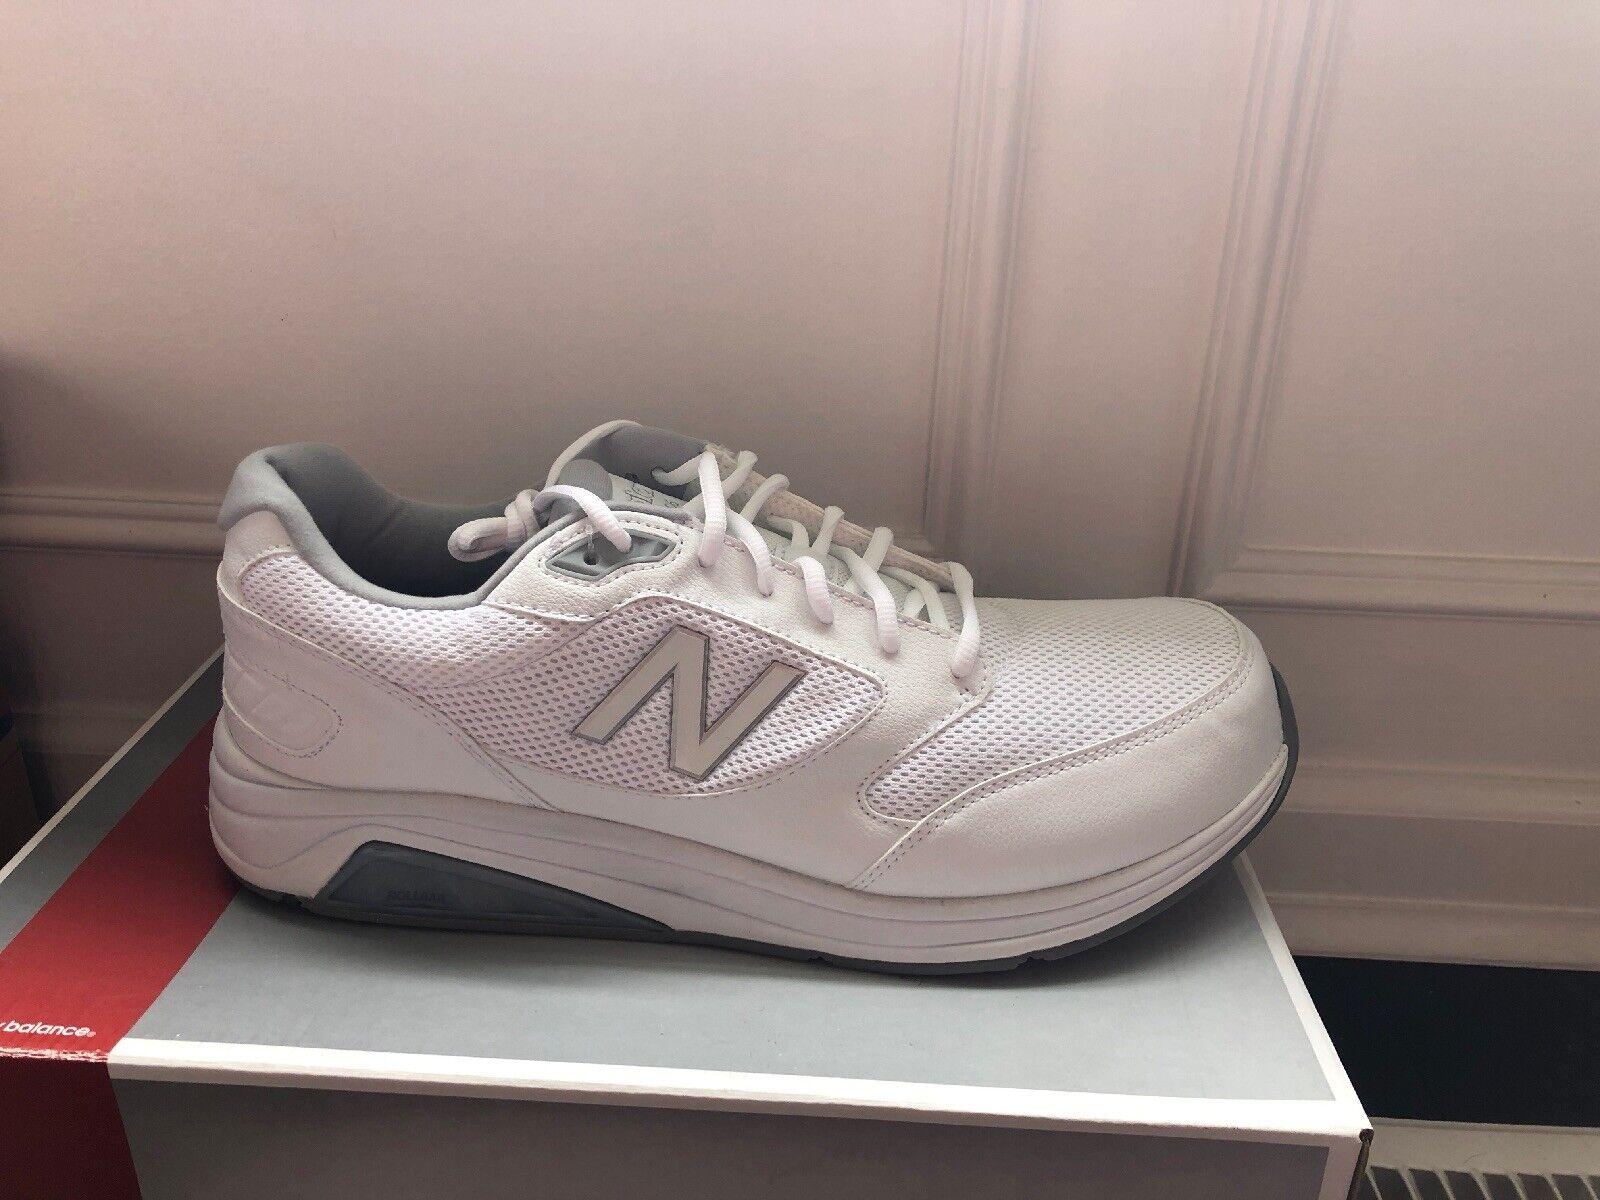 Para hombres Zapatos para Caminar New Balance 928v2 MW928WM2 blancoo 13 2E Hecho en EE. UU. nuevo